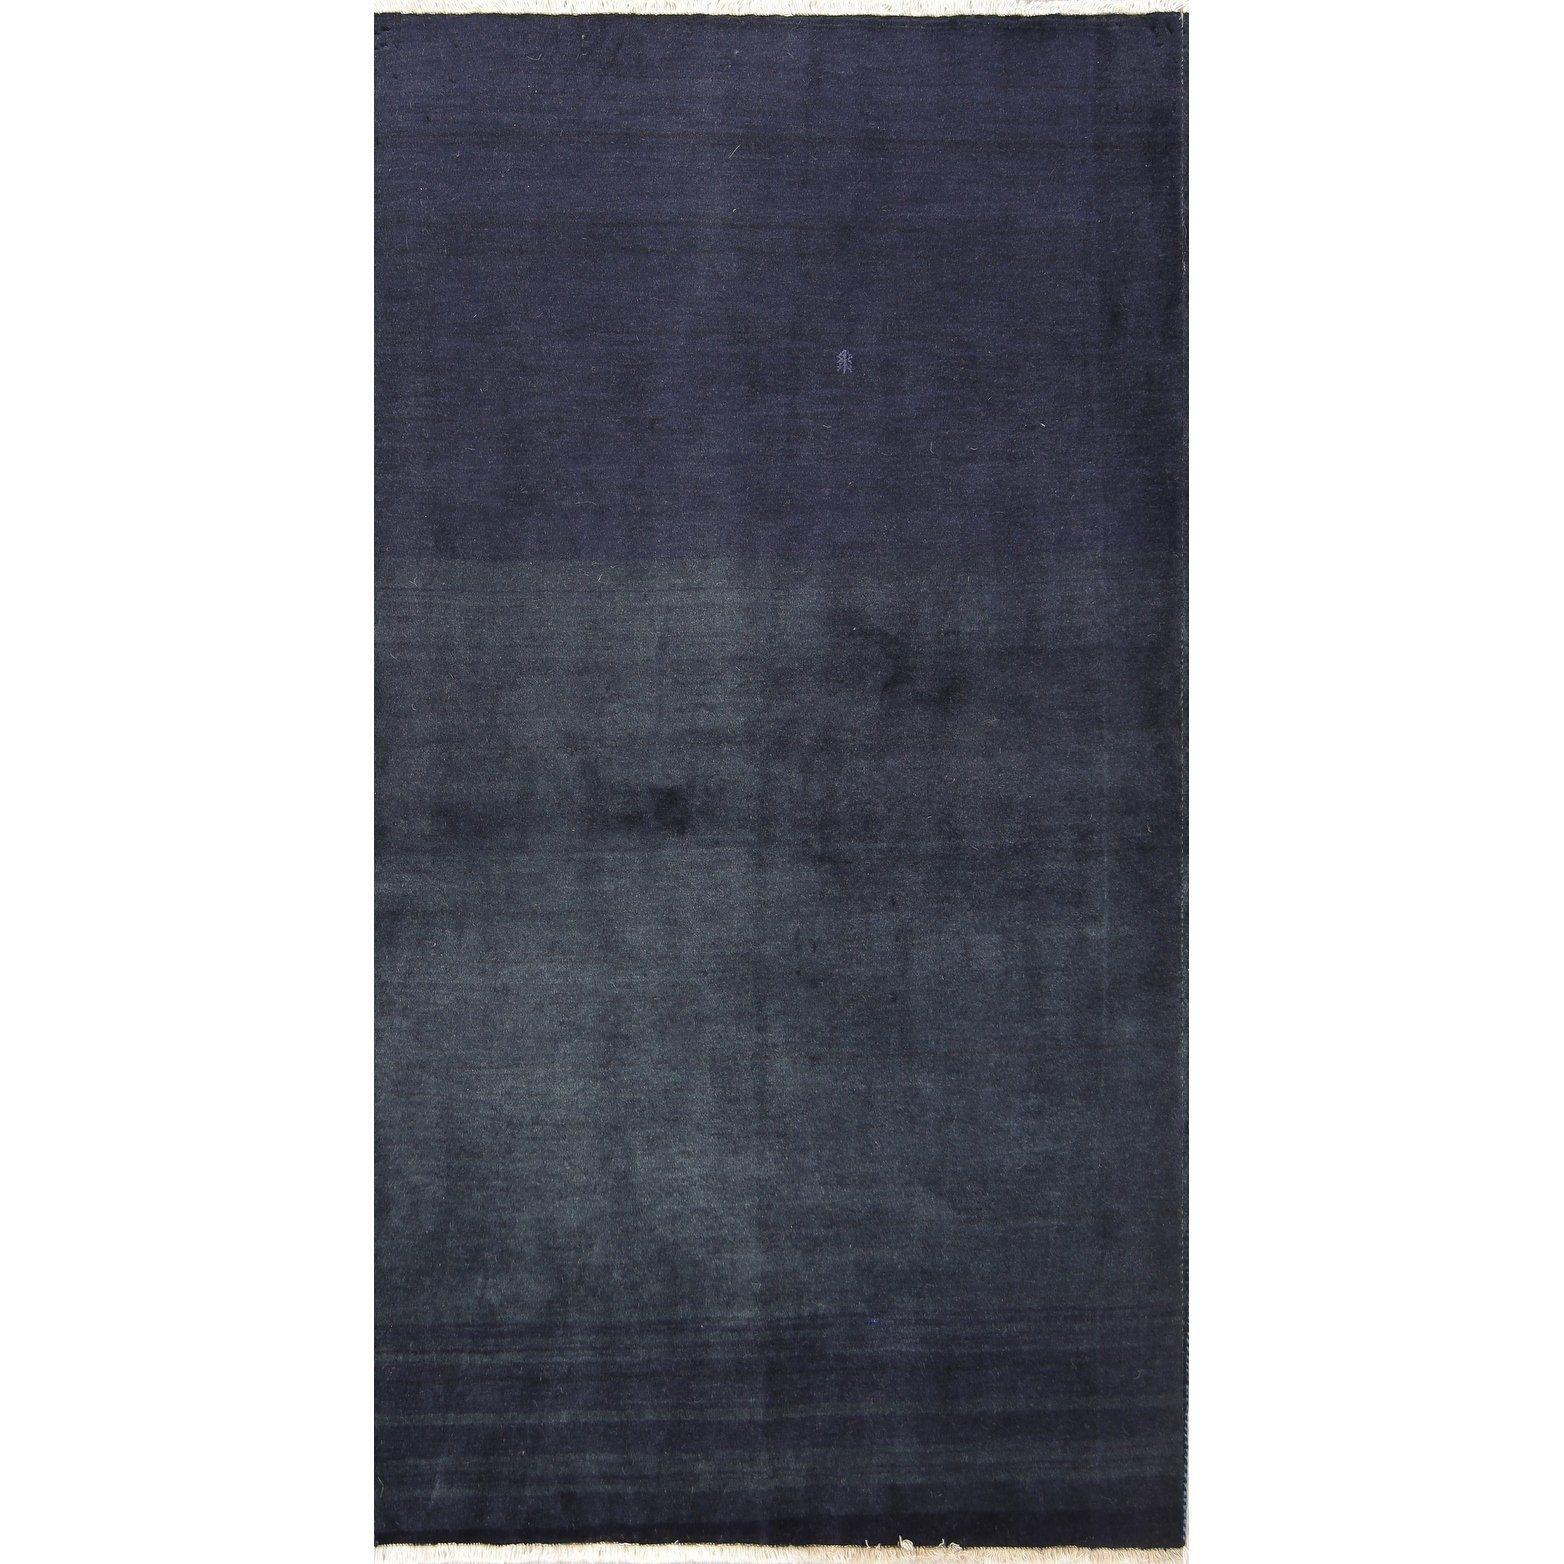 Handmade Wool Solid Modern Gabbeh Zolanvari Shiraz Persian Rug 6 1 X 3 3 Runner Wool Runner Rug Colorful Rugs Dark Gray Area Rug